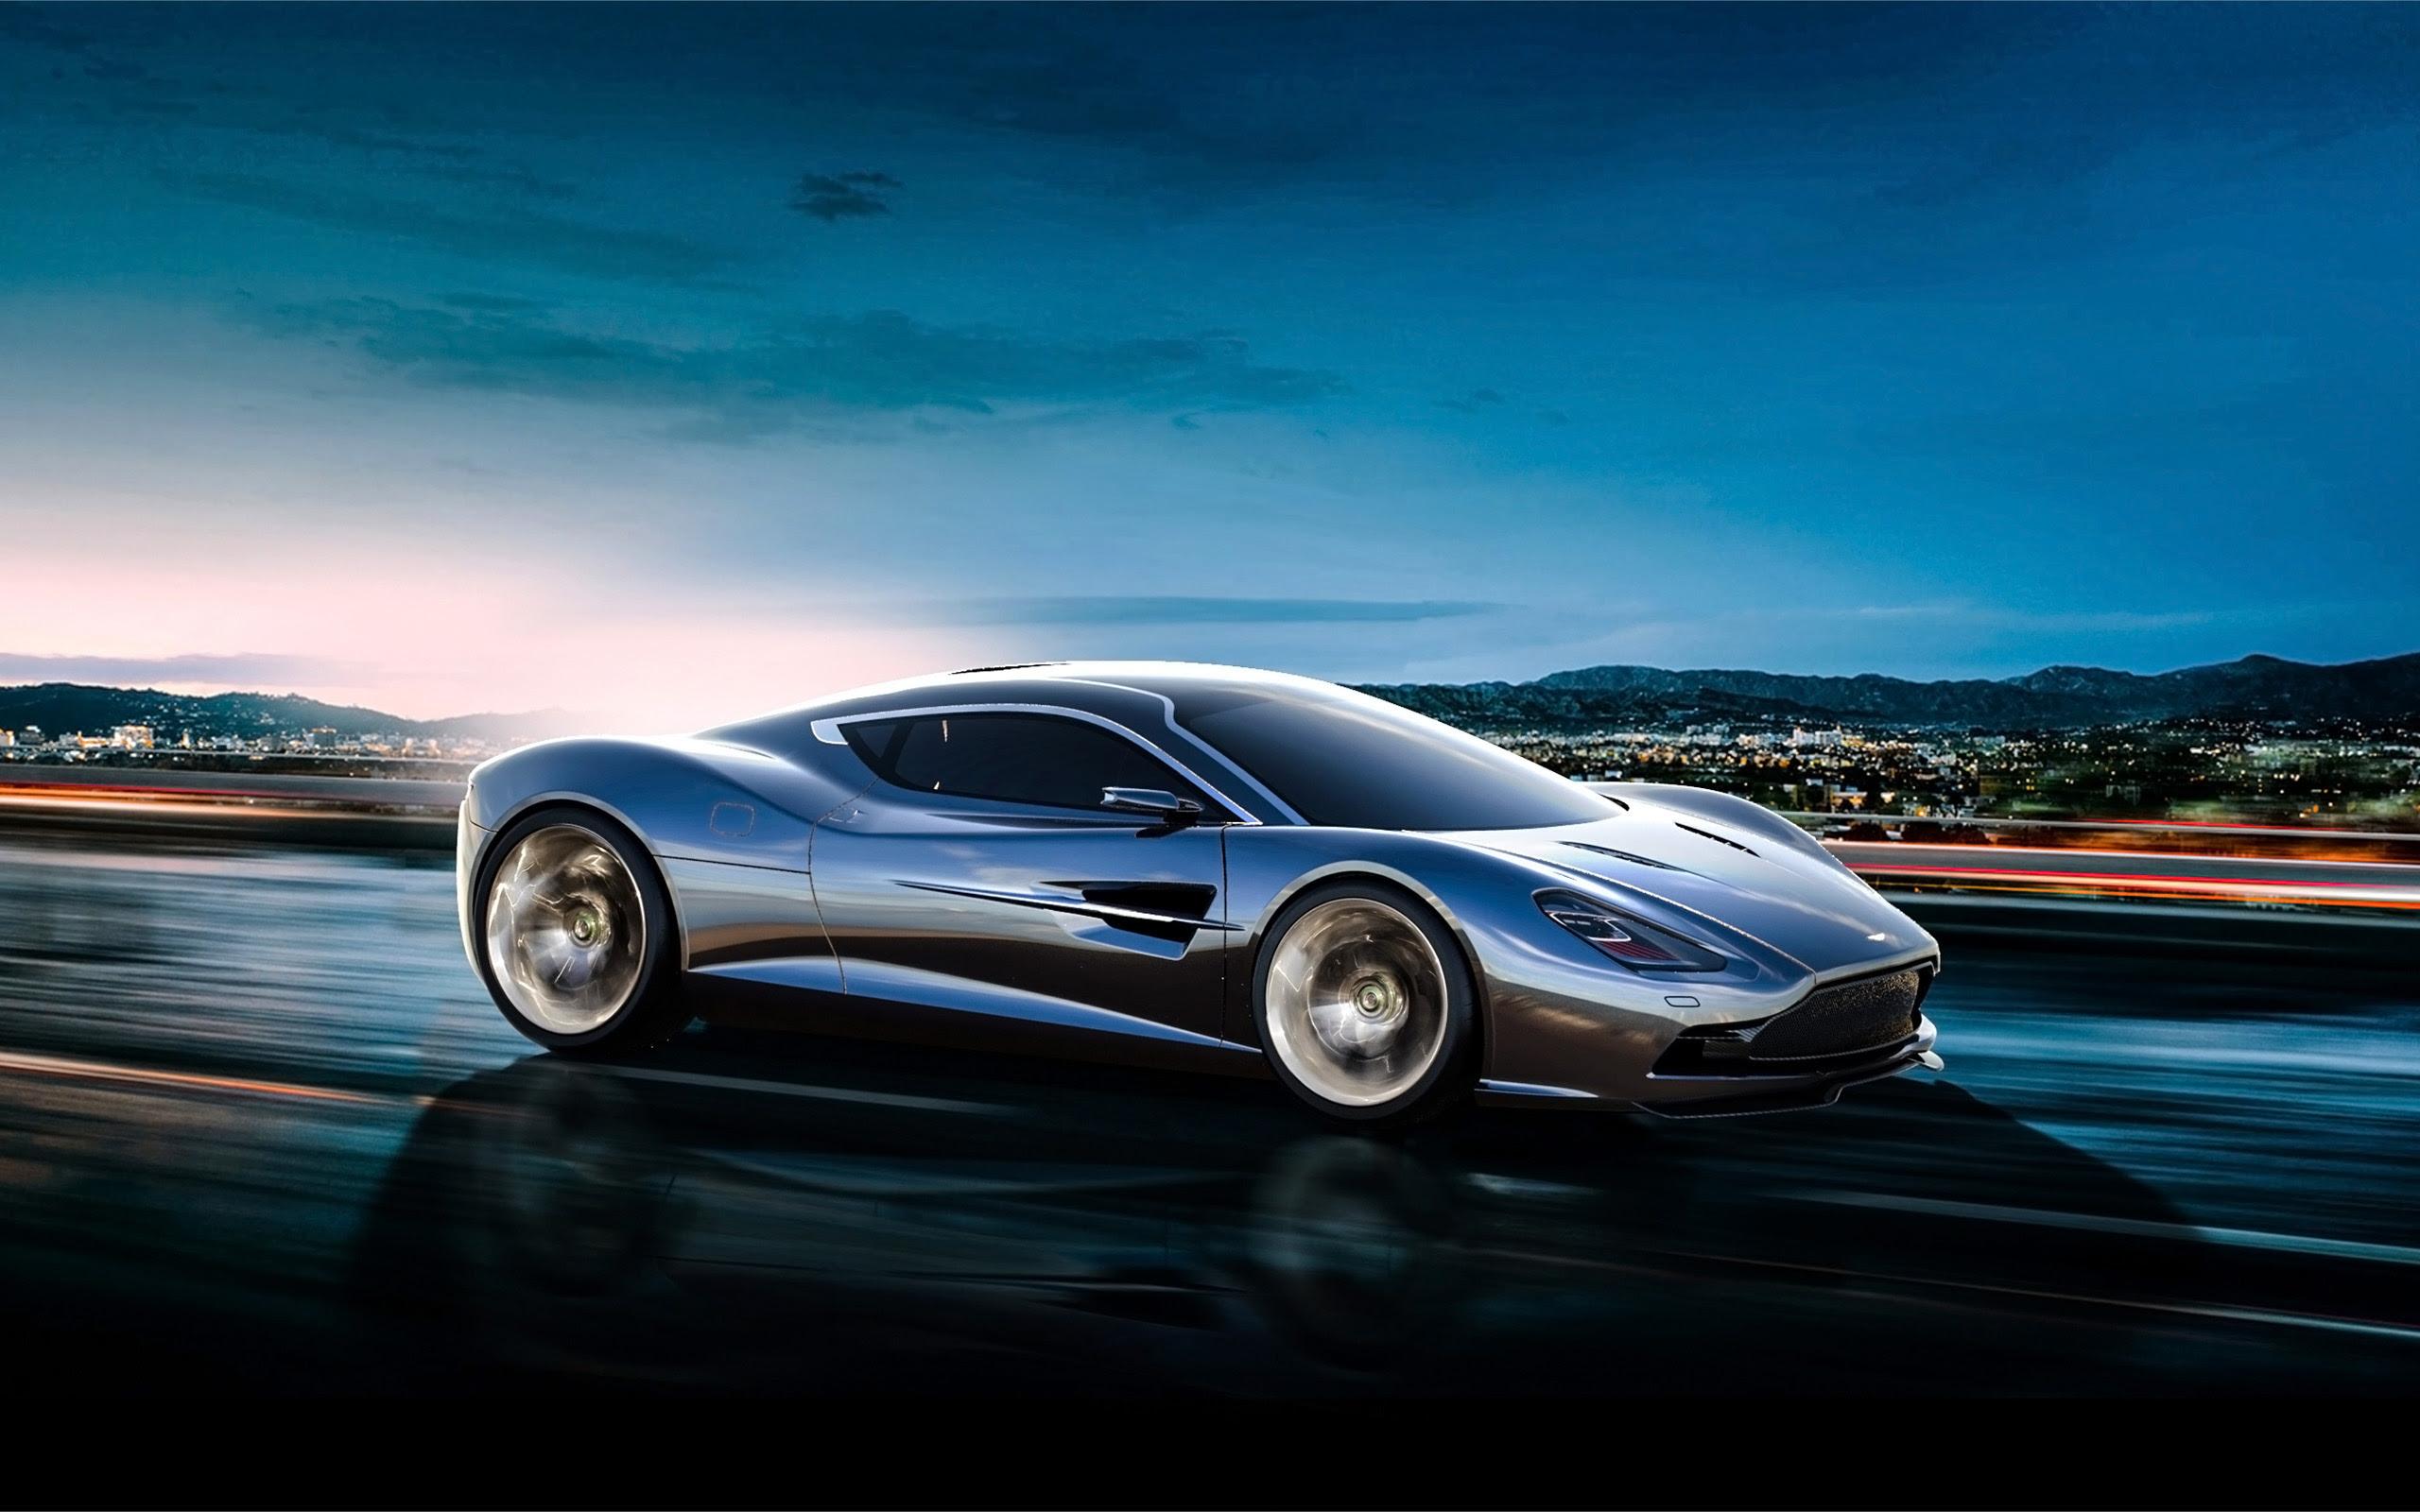 Aston Martin Cars 35 Cool Car Hd Wallpaper Hd Wallpaper Car